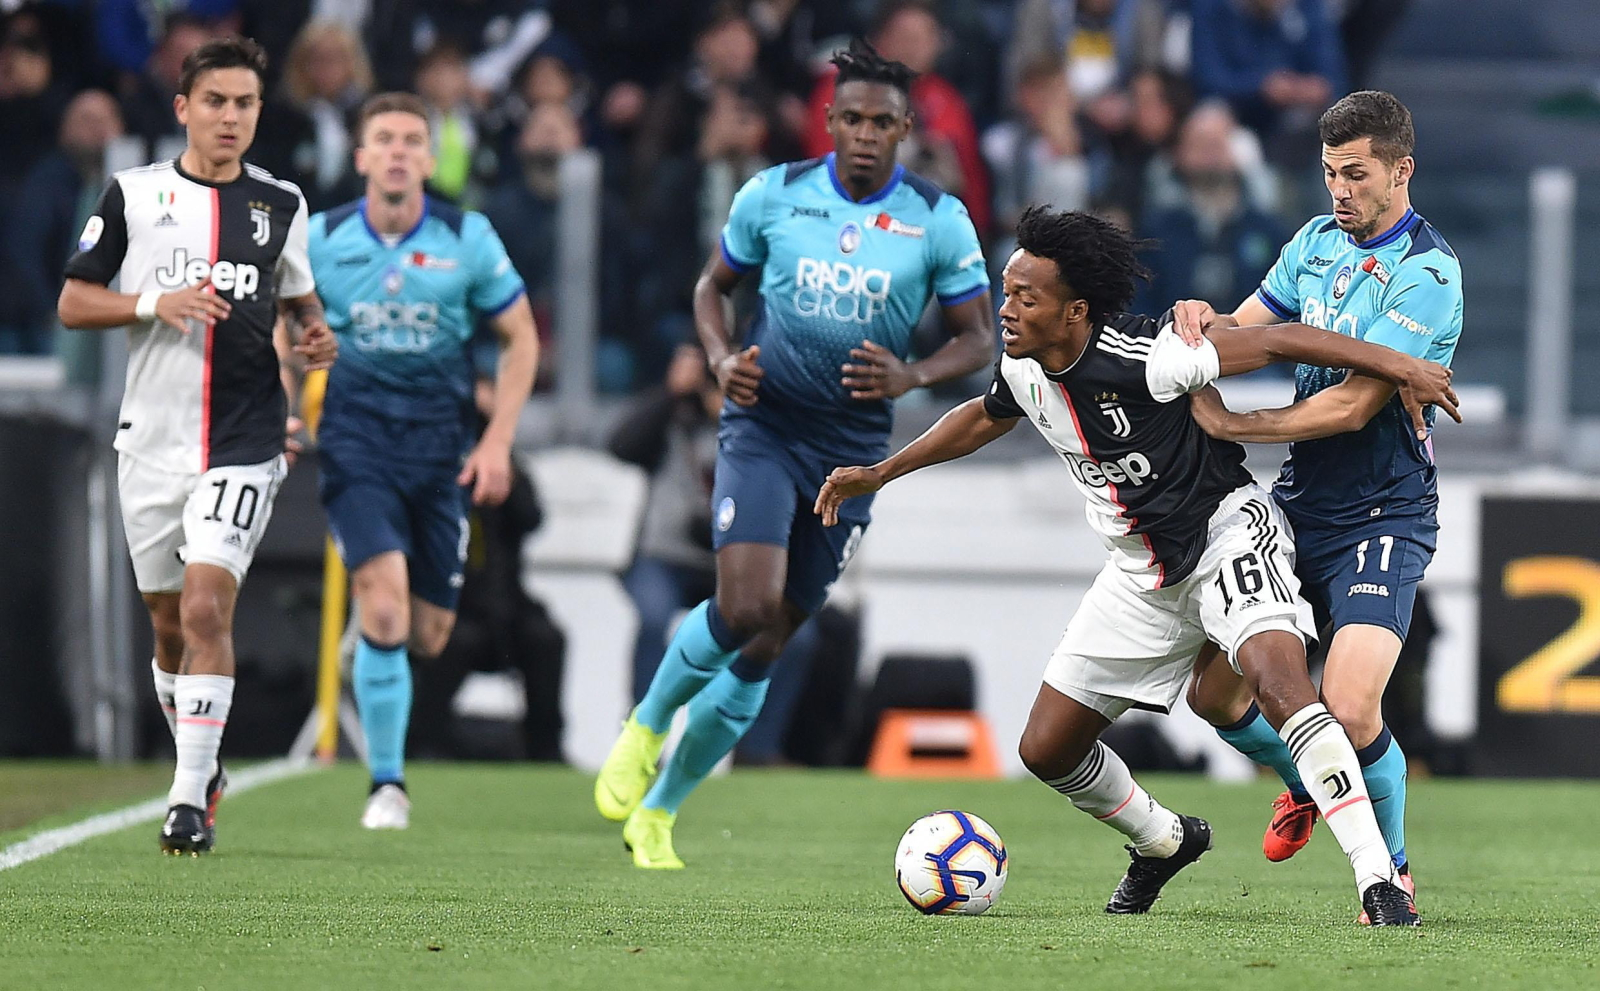 Mecz włoskiej Serie A. Fot. PAP/EPA/ALESSANDRO DI MARCO